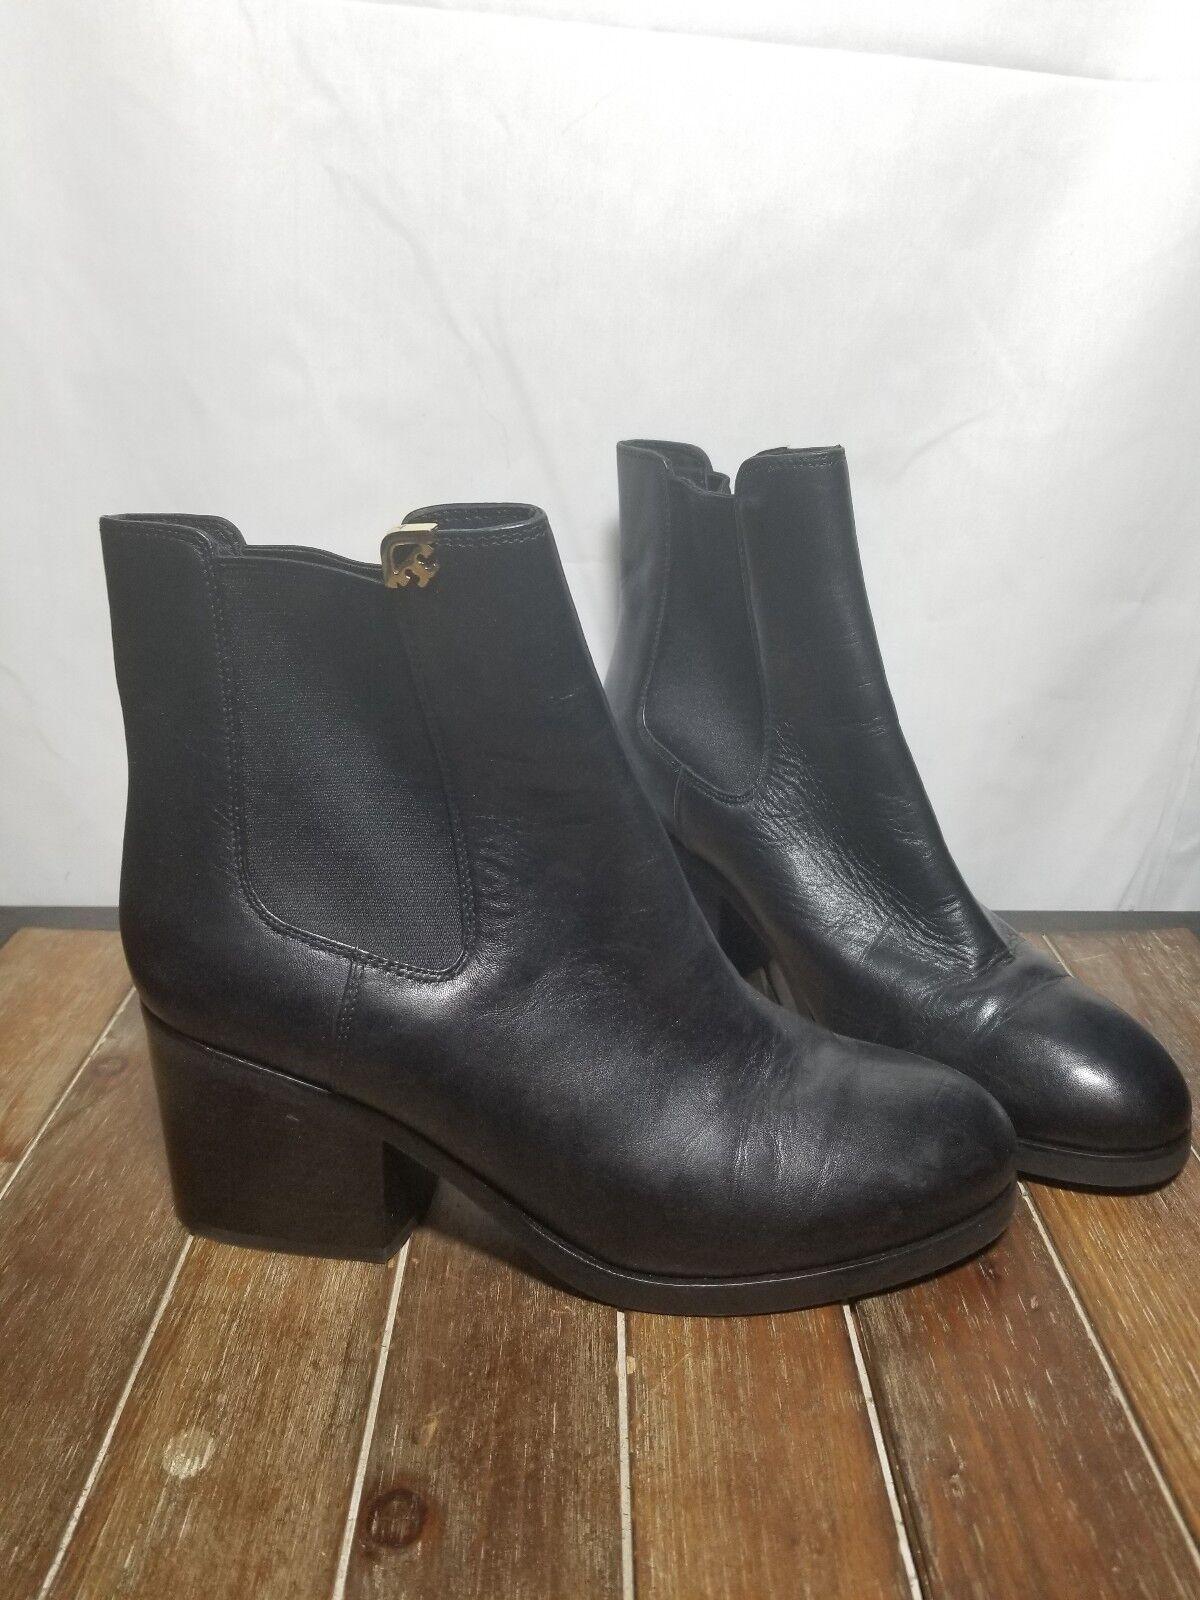 TORY BURCH Black Leather Block Heel Booties w/ Elastic Sides Sz 8.5